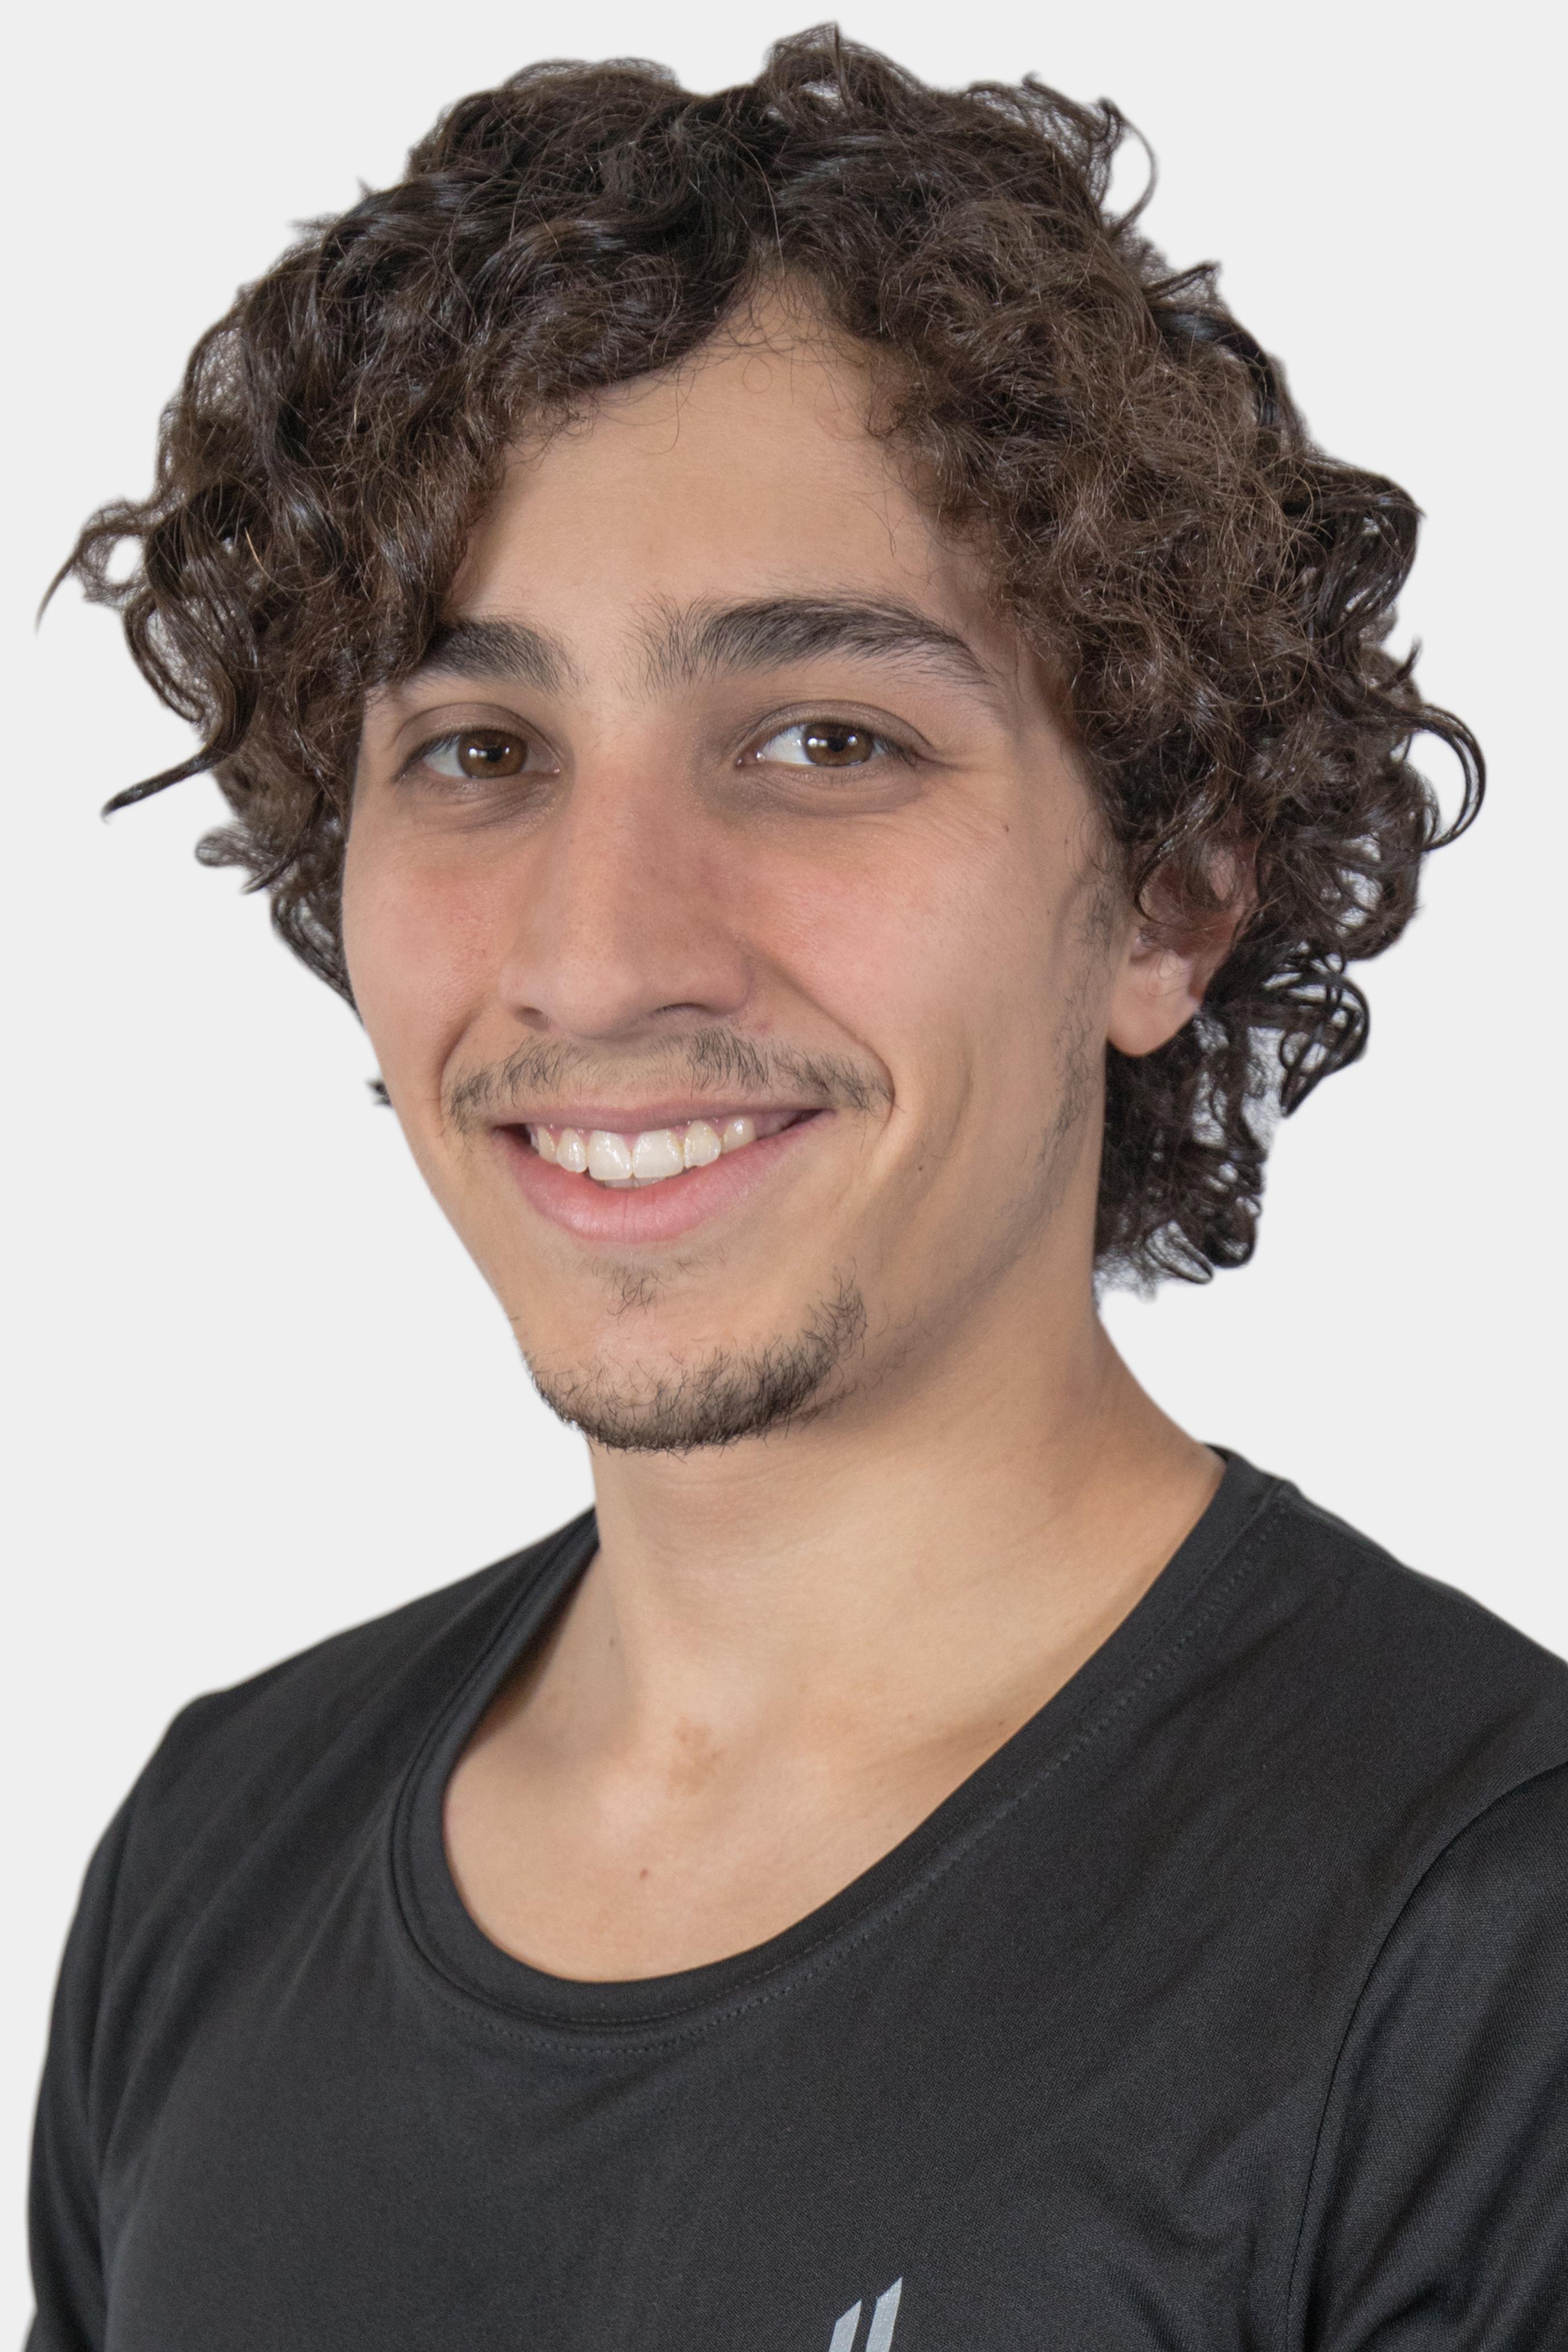 Eli Schenkel